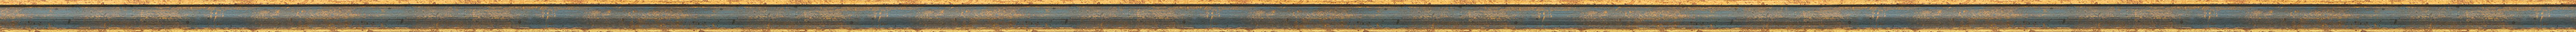 Blue and gold frame frame